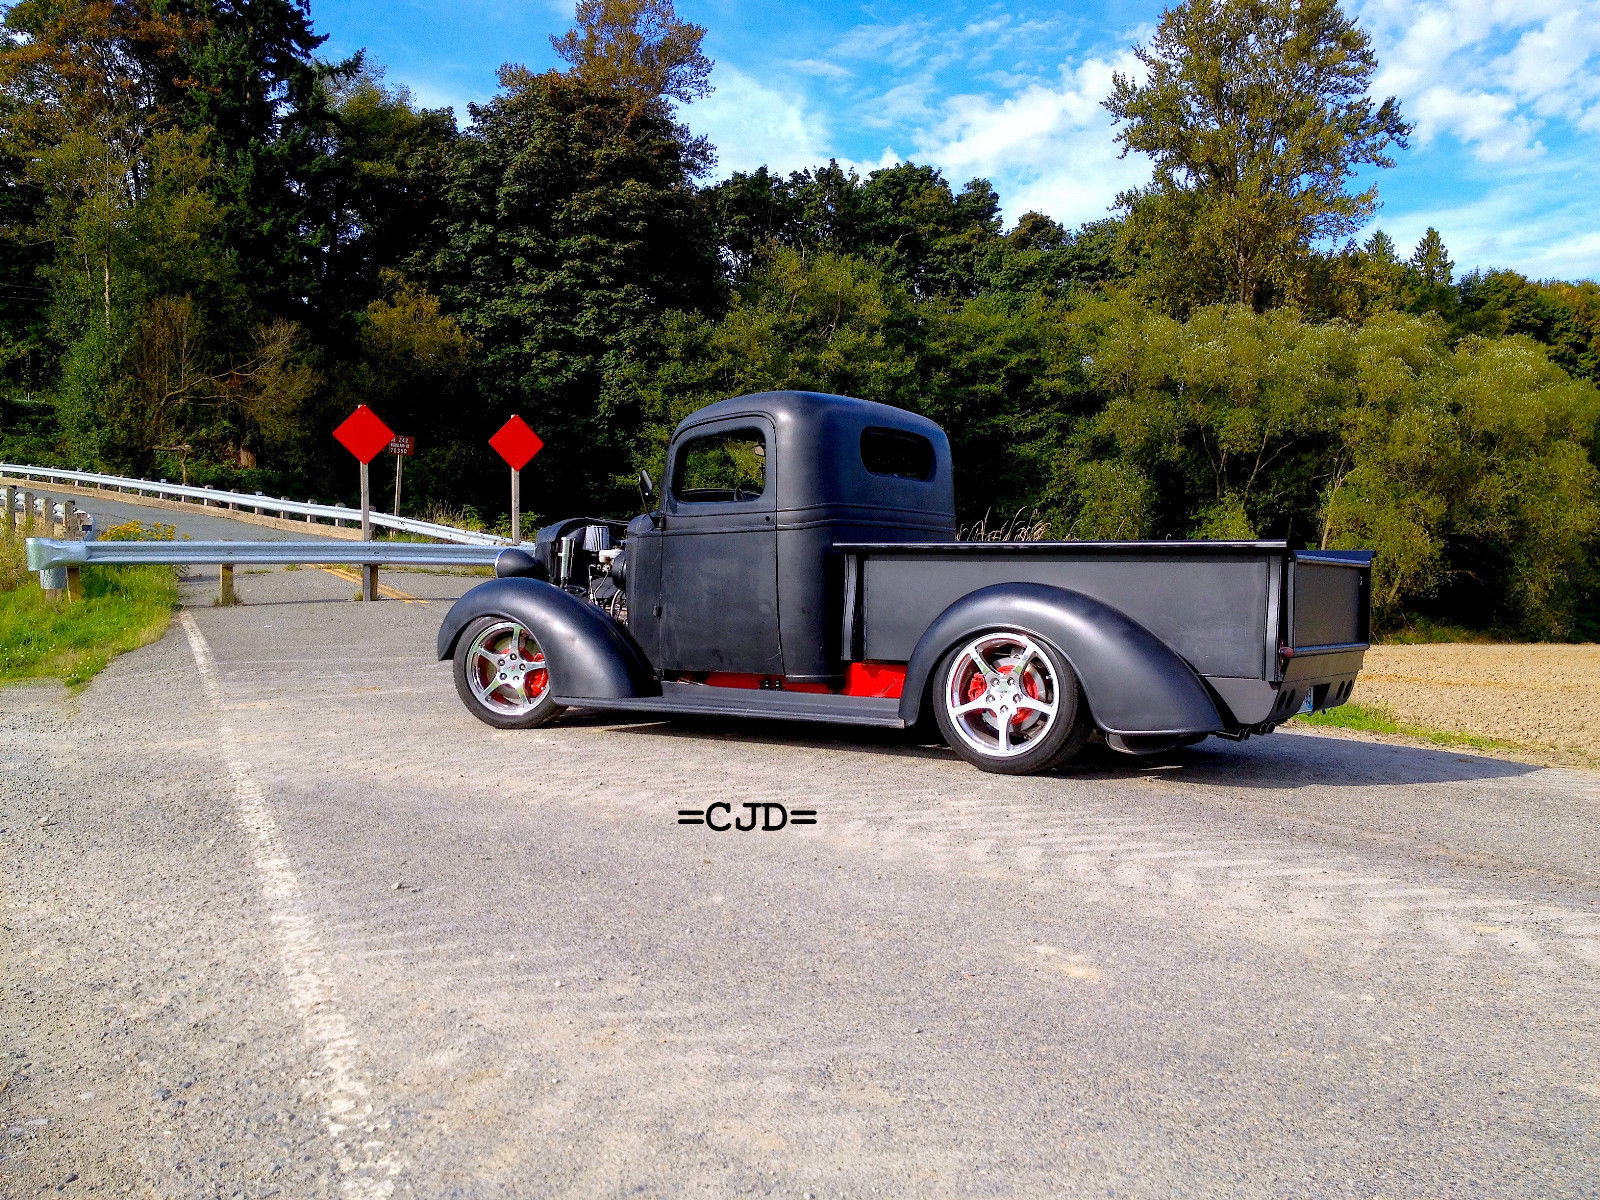 1937 Chevy Pickup truck corvette ls1 t56 street rod hot project custom